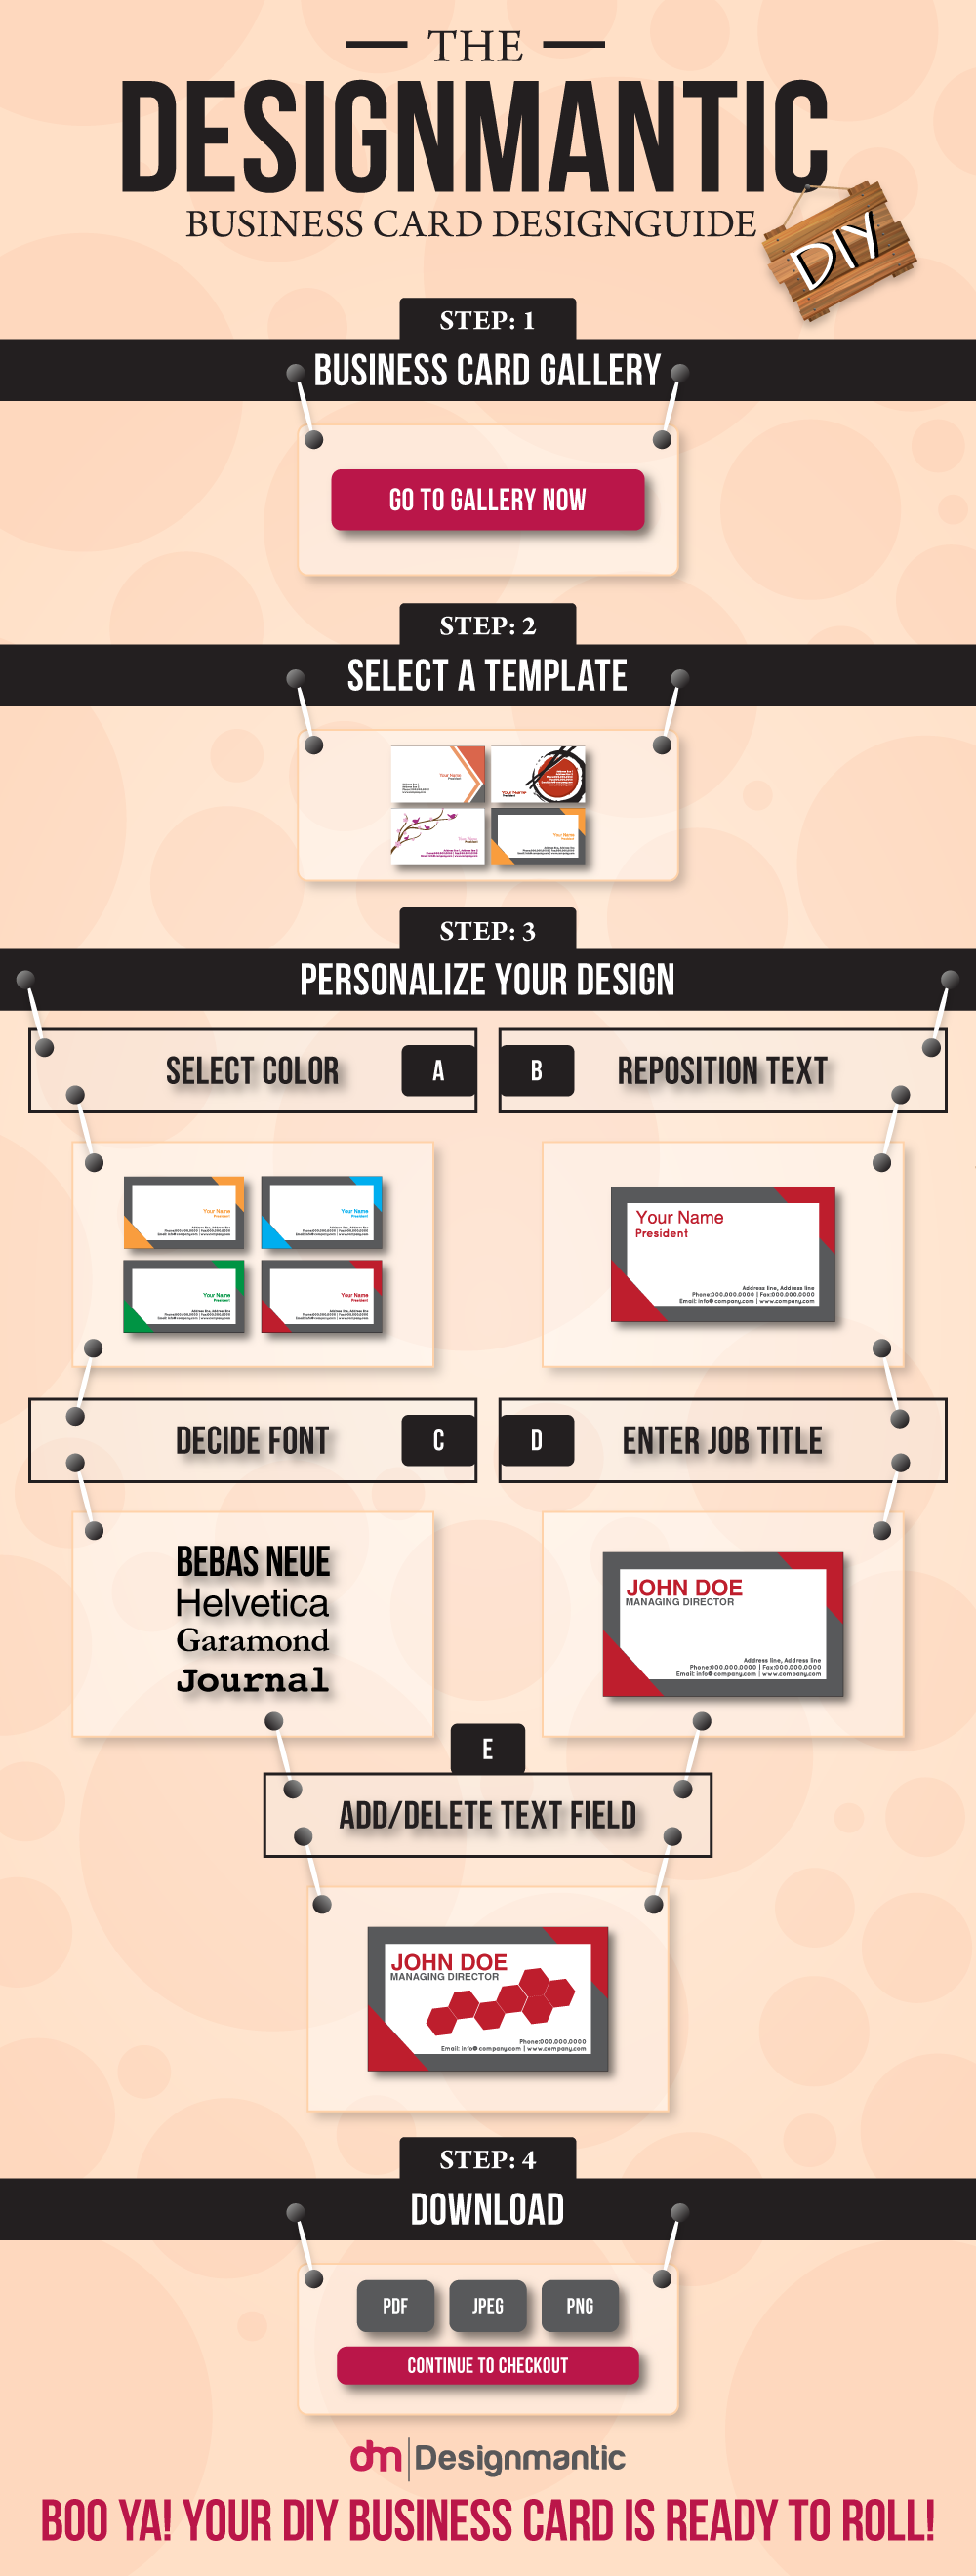 A Business Card Design Guide of DesignMantic